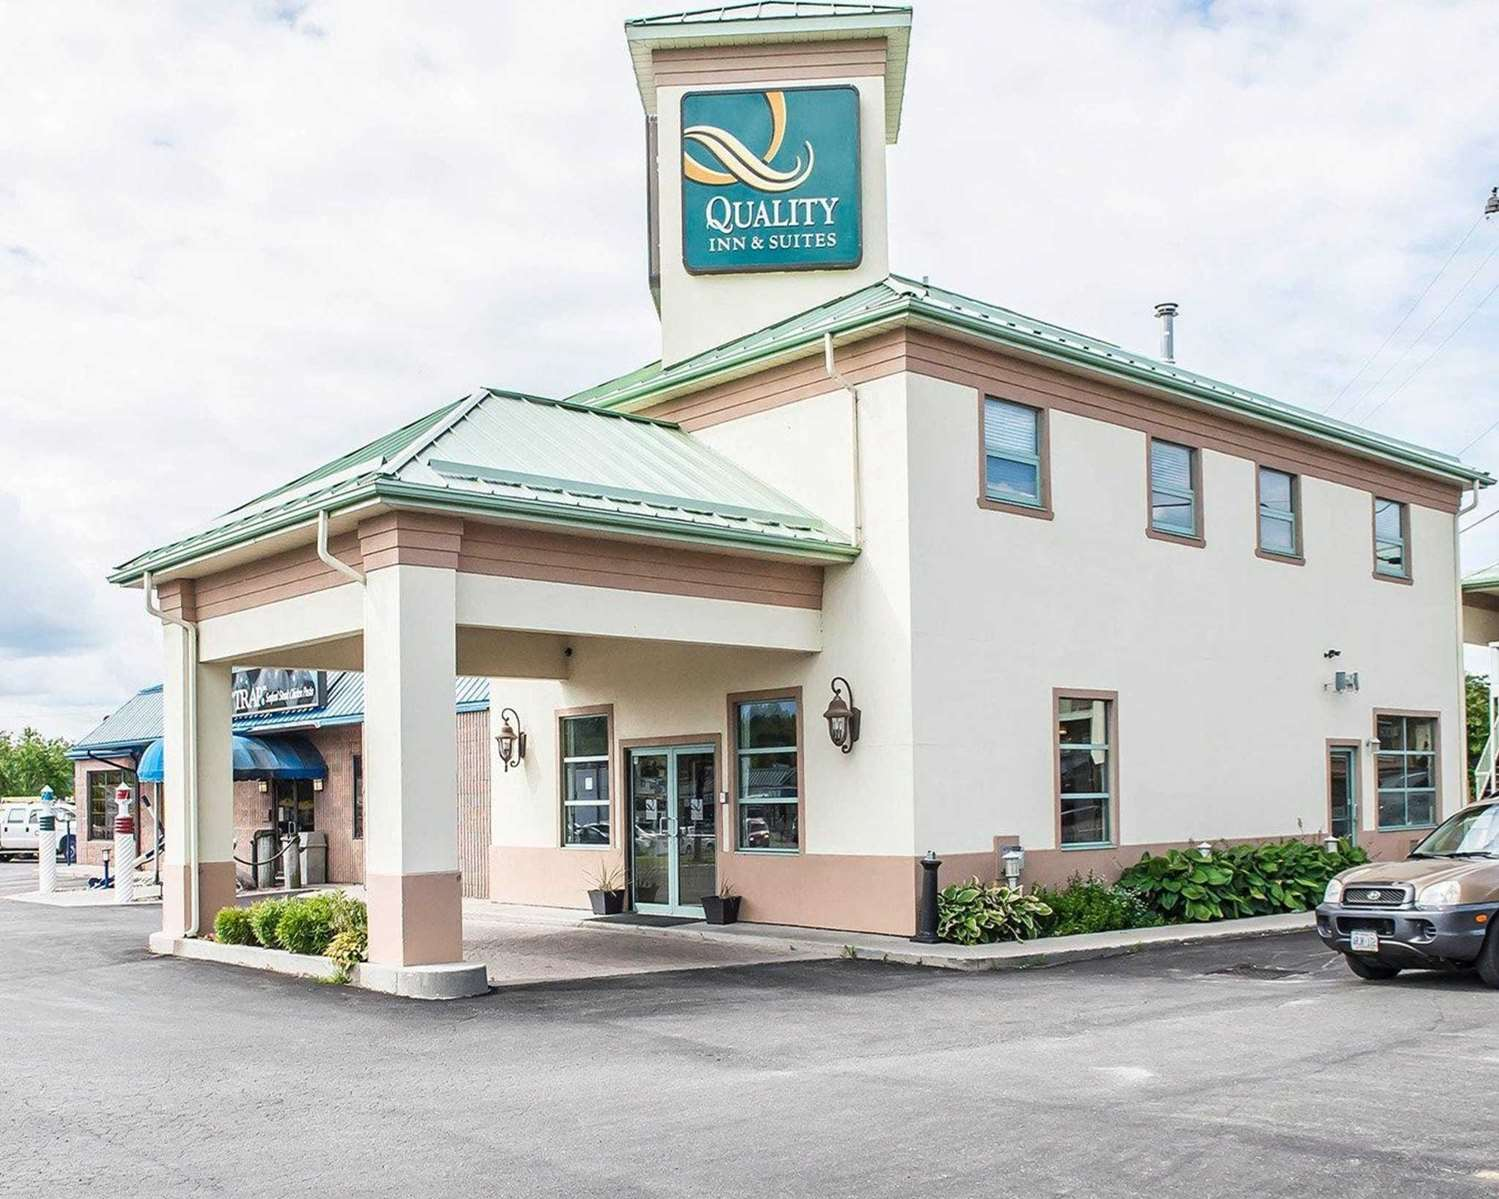 Exterior view - Quality Inn & Suites 1000 Islands Gananoque